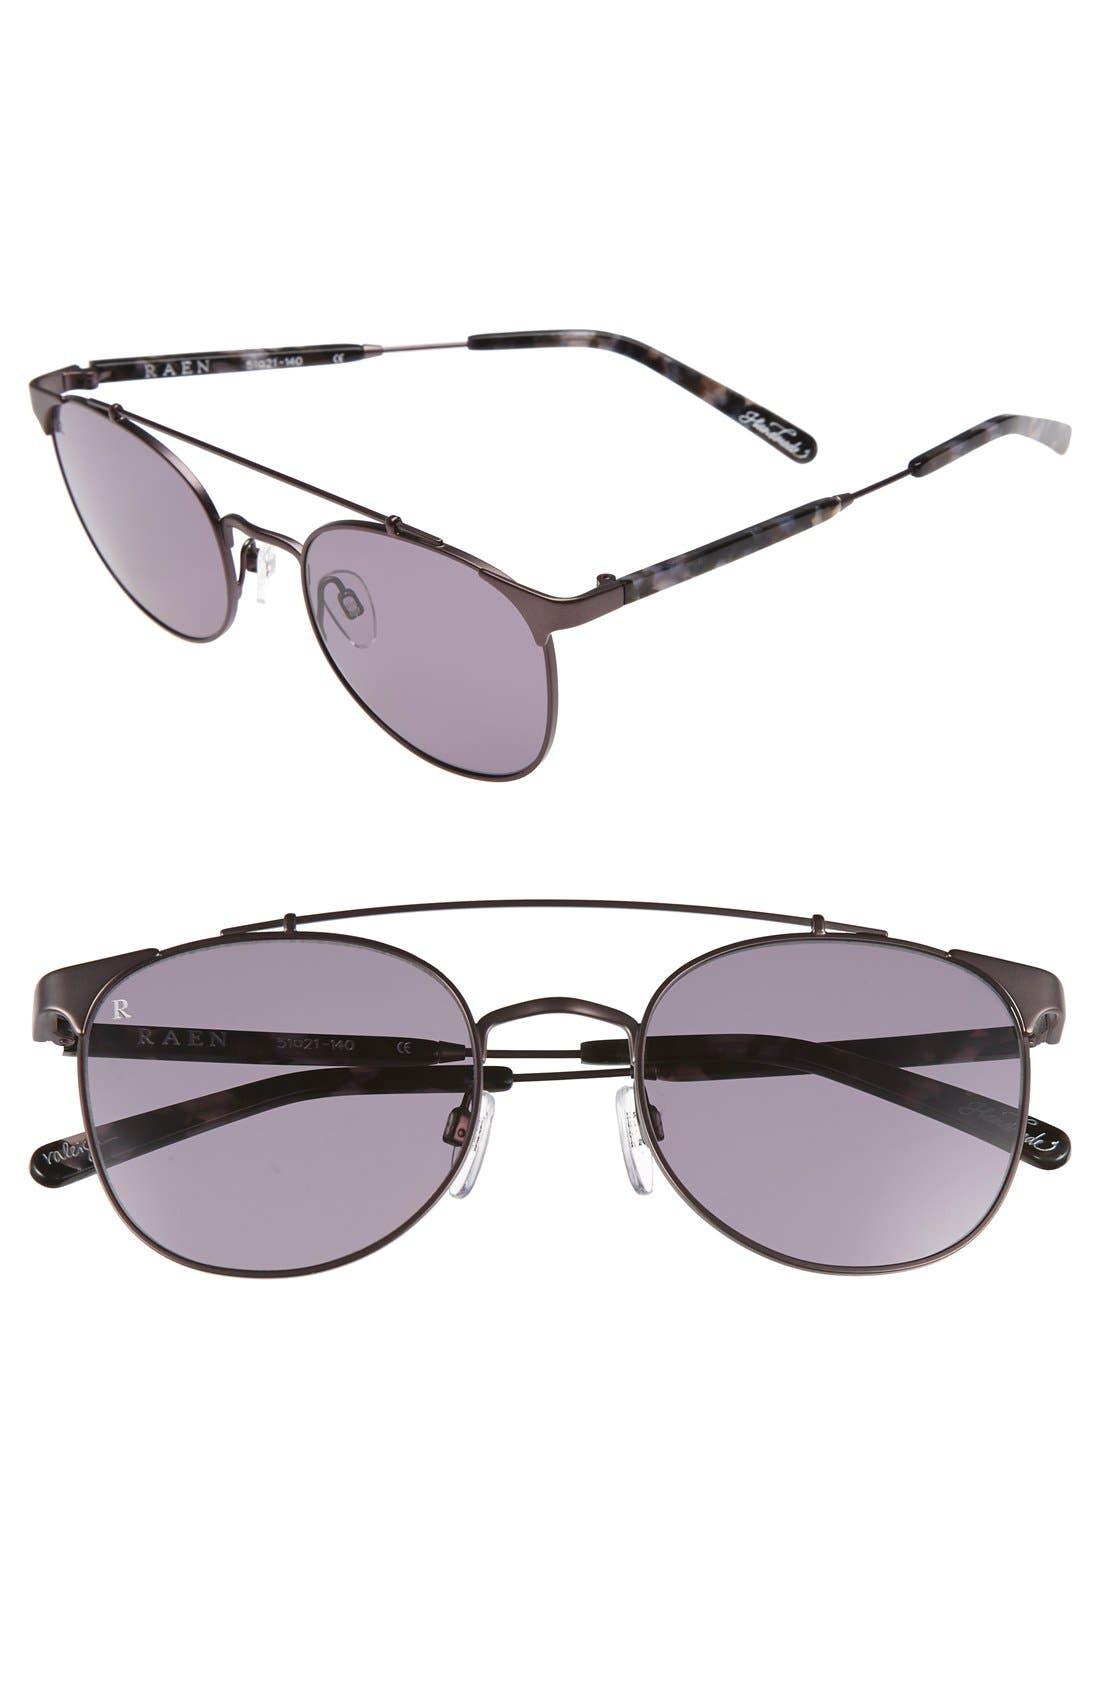 'Raleigh' 51mm Sunglasses,                             Main thumbnail 1, color,                             MATTE RIPPLE